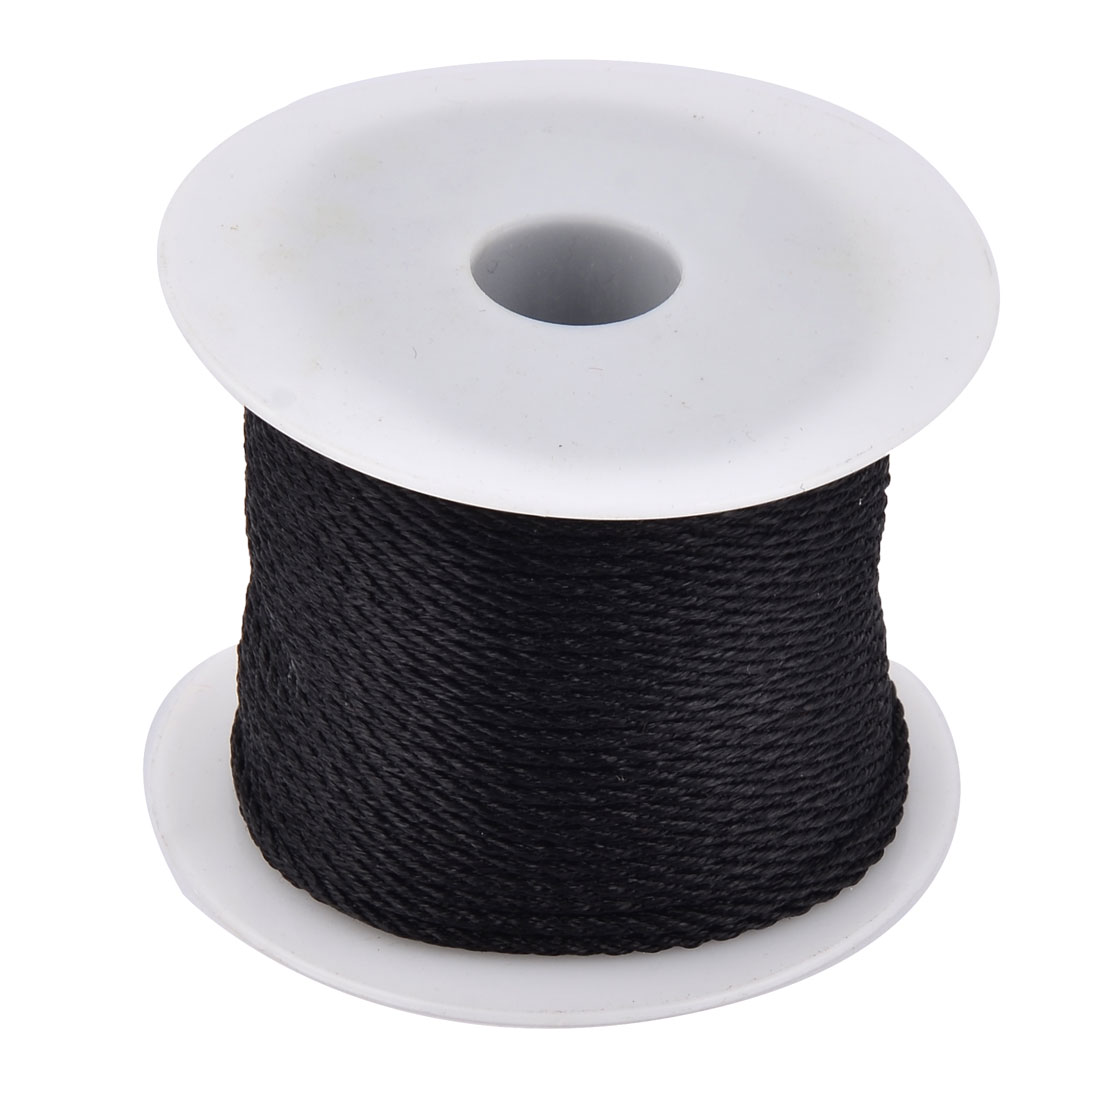 Household Nylon Handcraft Chinese Knot Jewelry Making Cord String Black 39 Yards